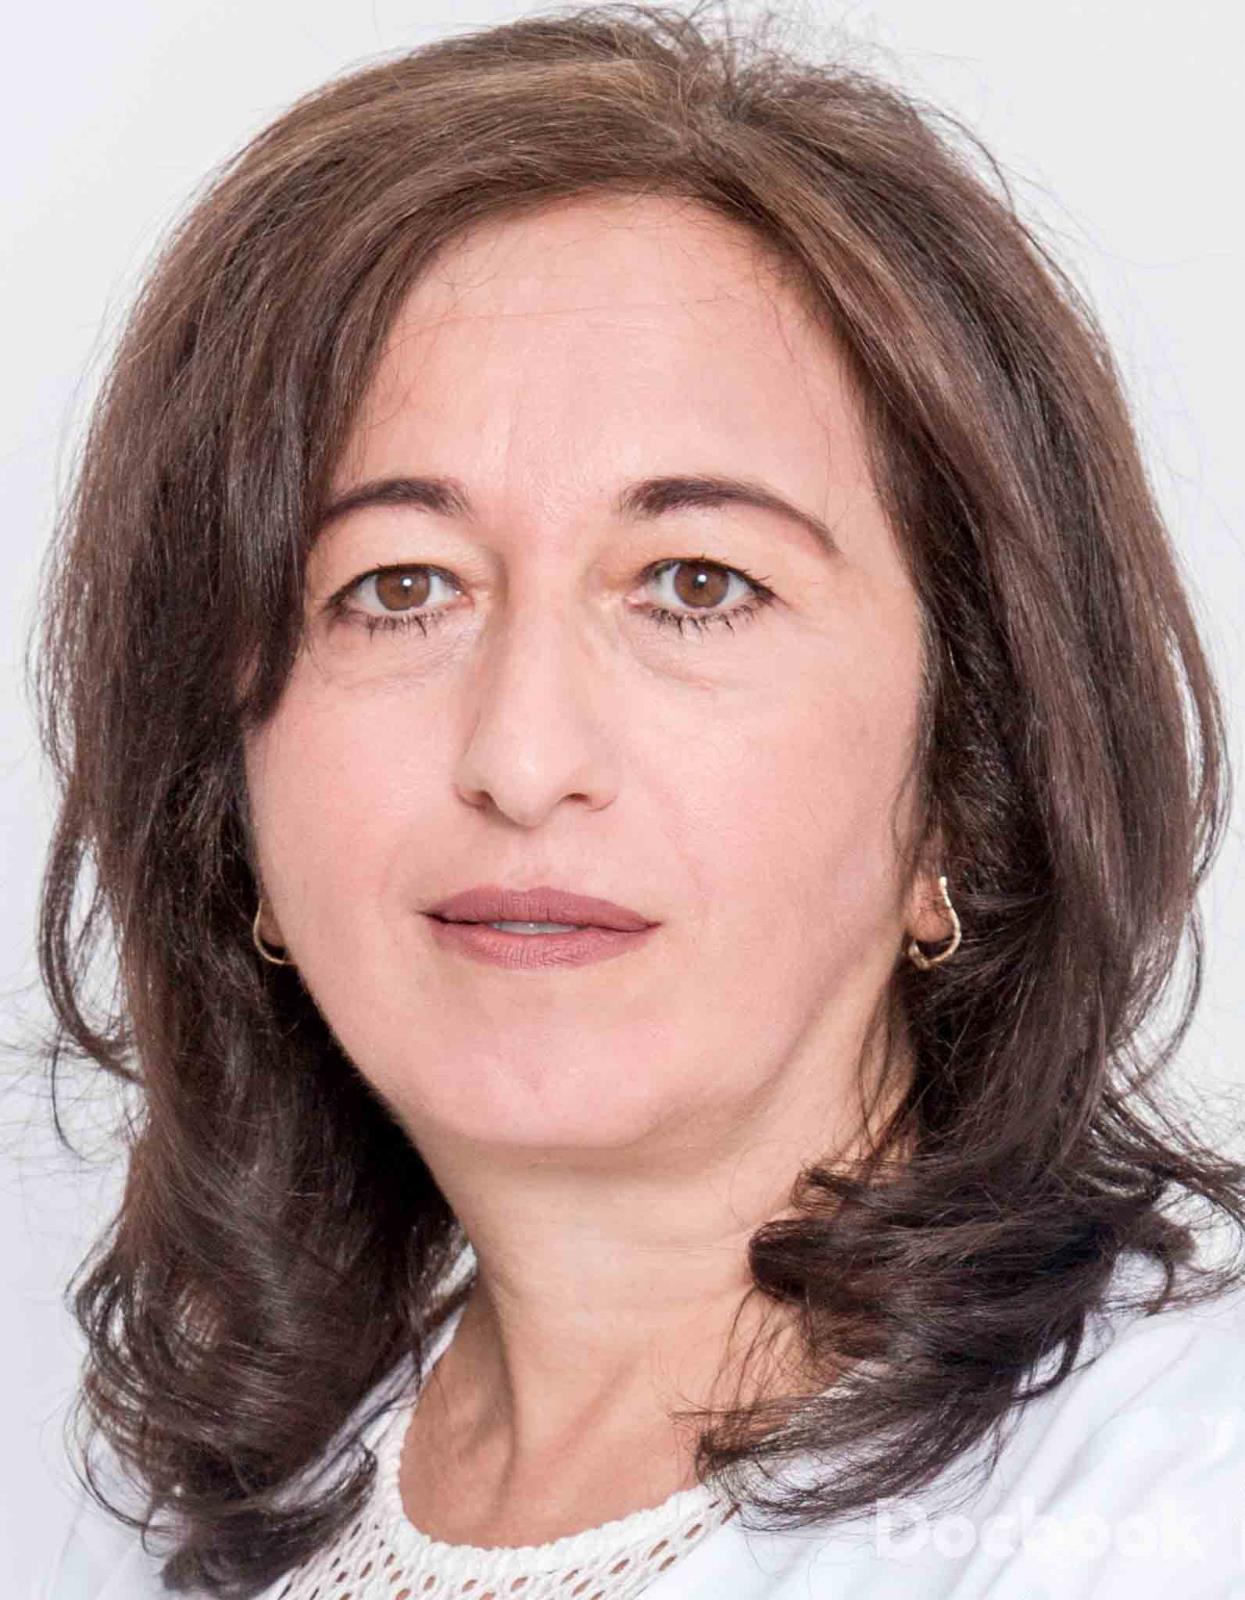 Dr. Irina Turcan